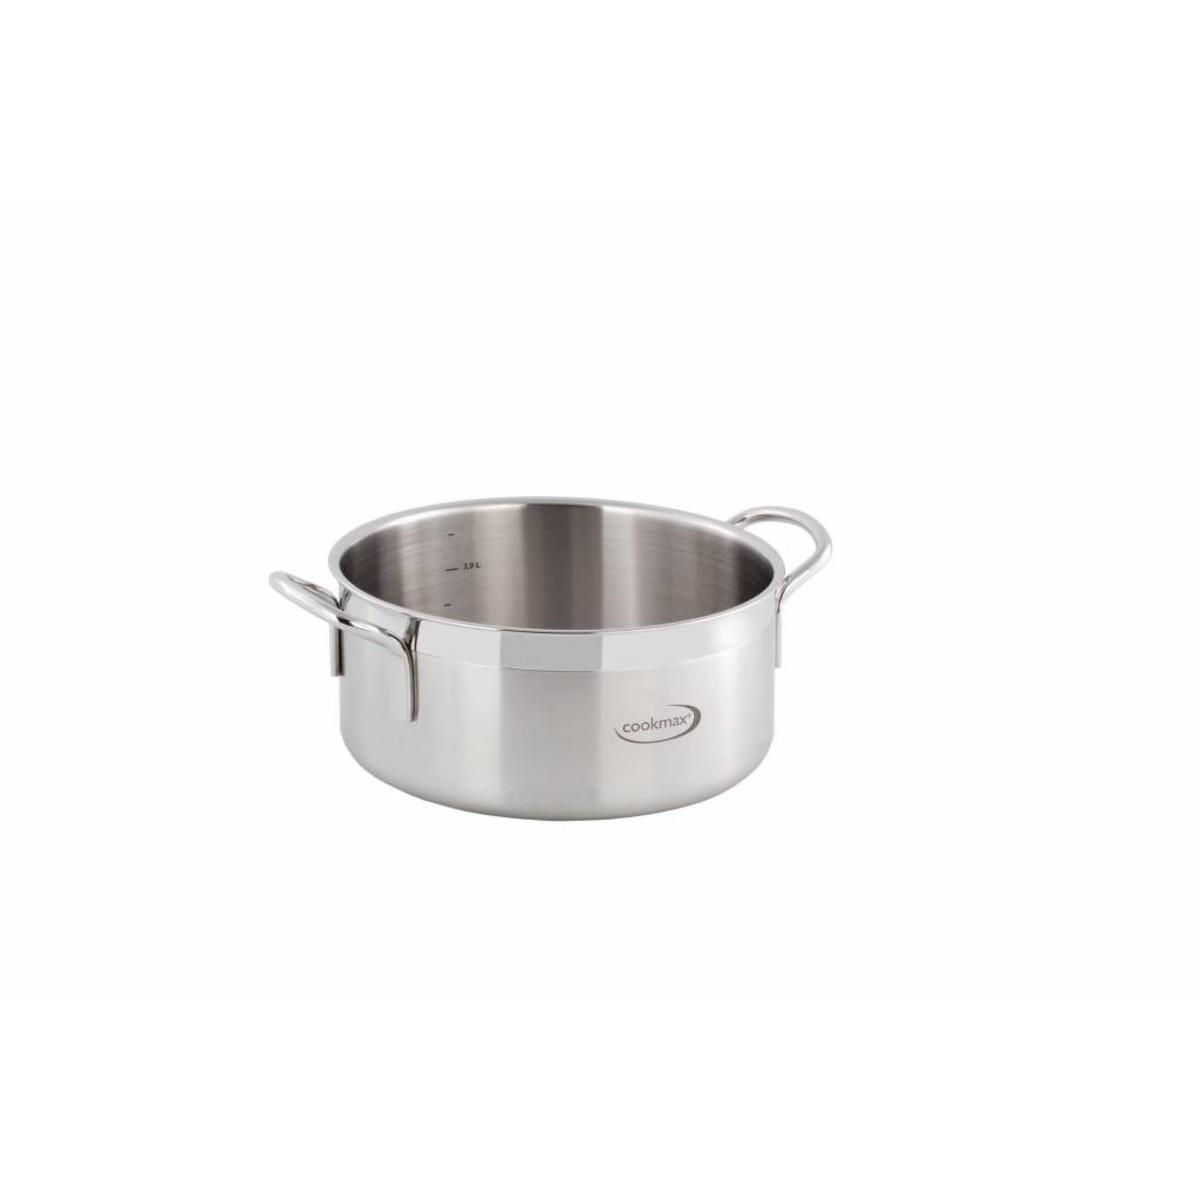 "Bratentopf flach ""Cookmax Gourmet"" Ø 36 cm, H: 17 cm. Inhalt 17,3L"